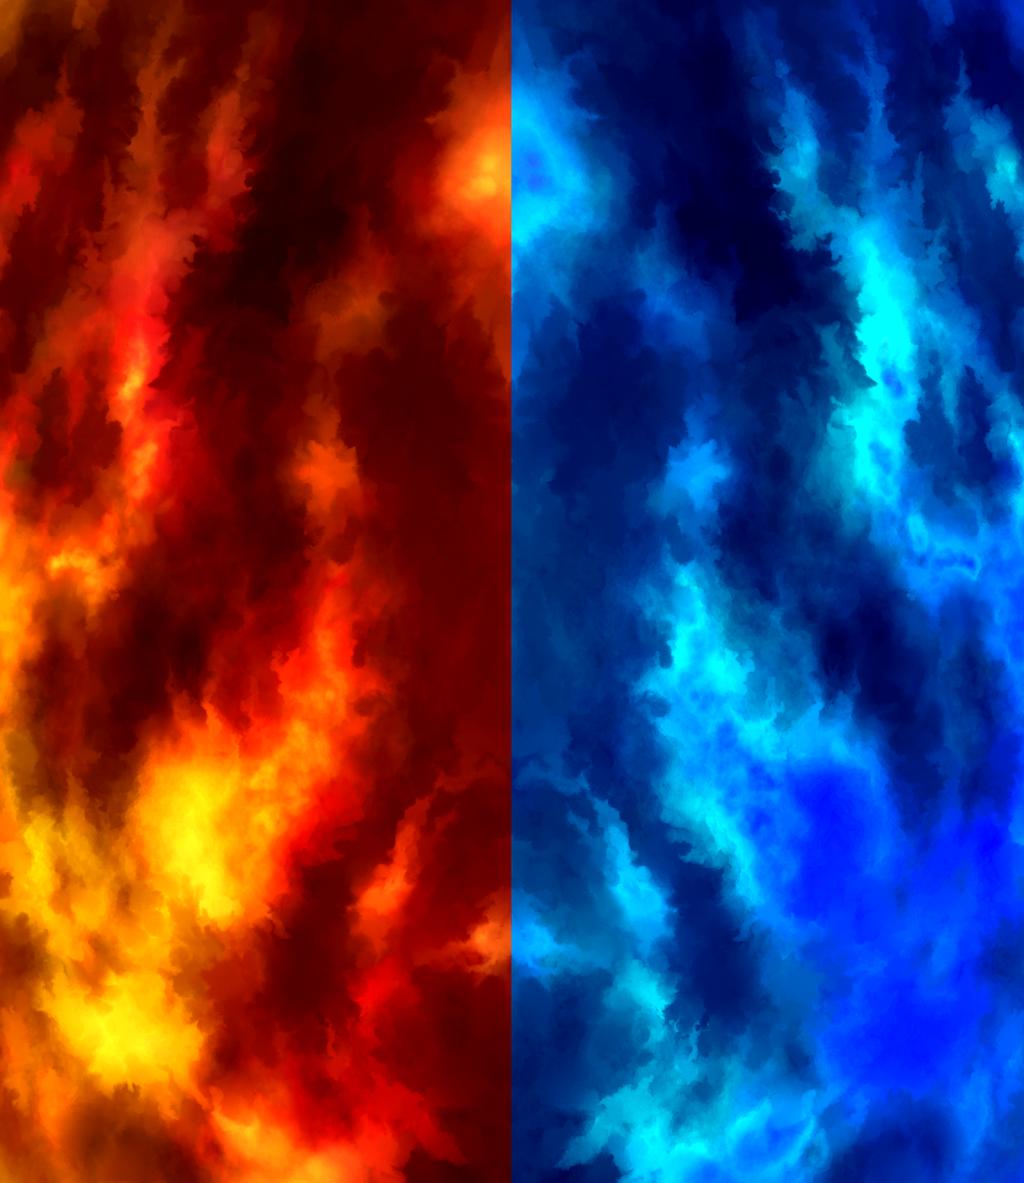 Fire And Ice By Deltorafann001 On DeviantART